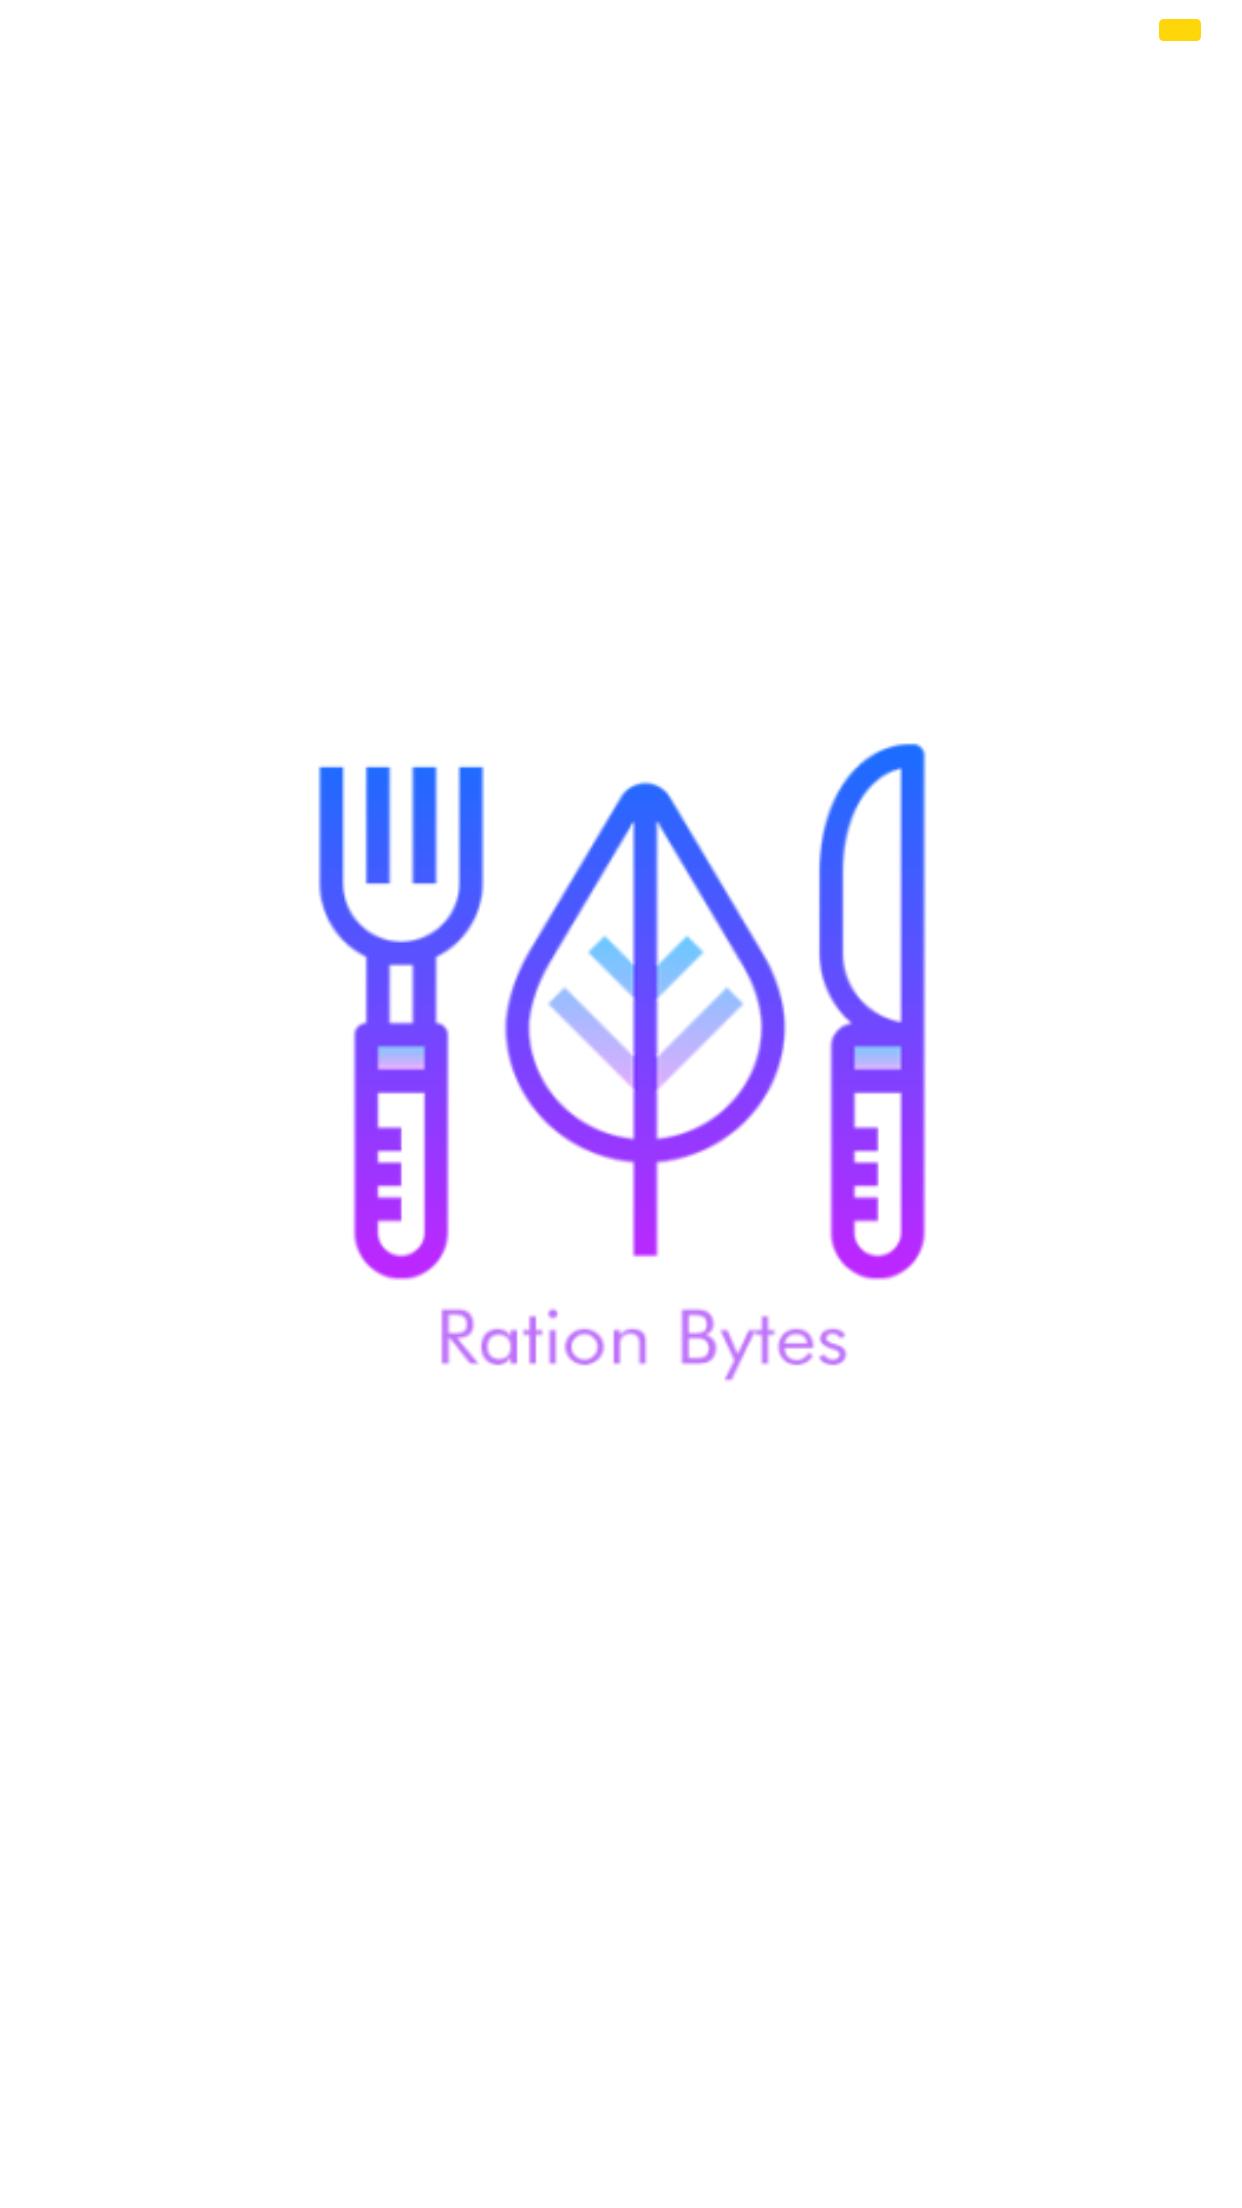 Ration Bytes